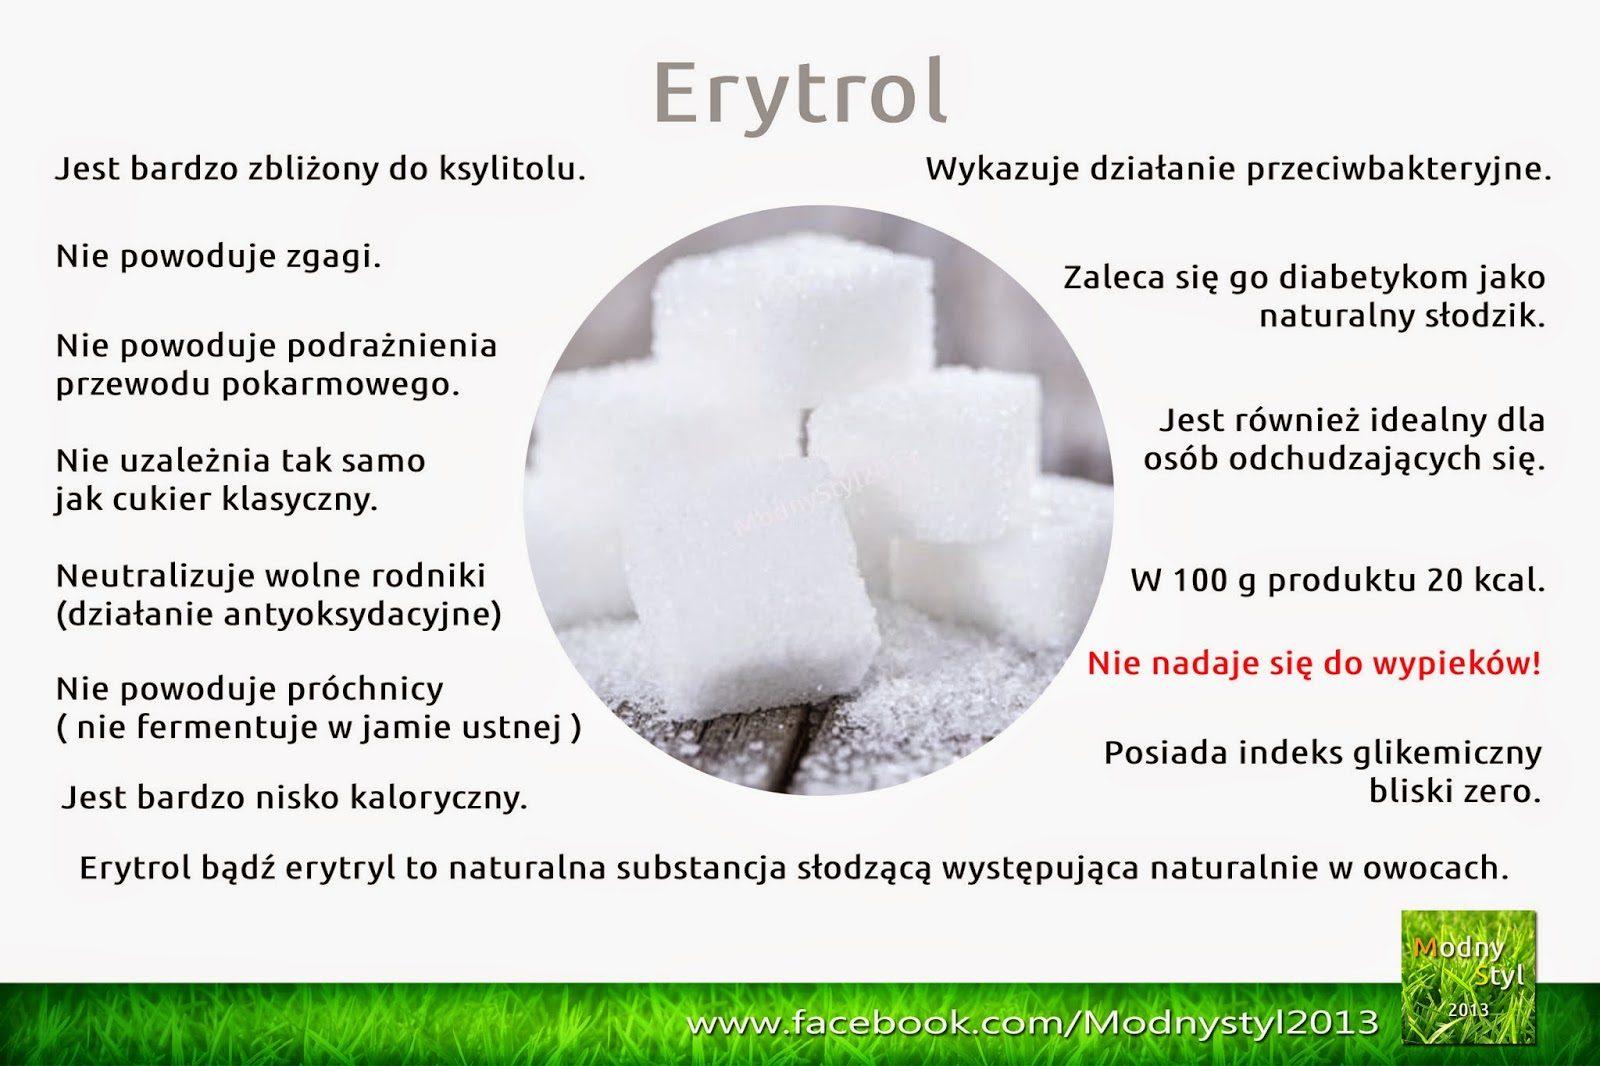 erytrol-2460410